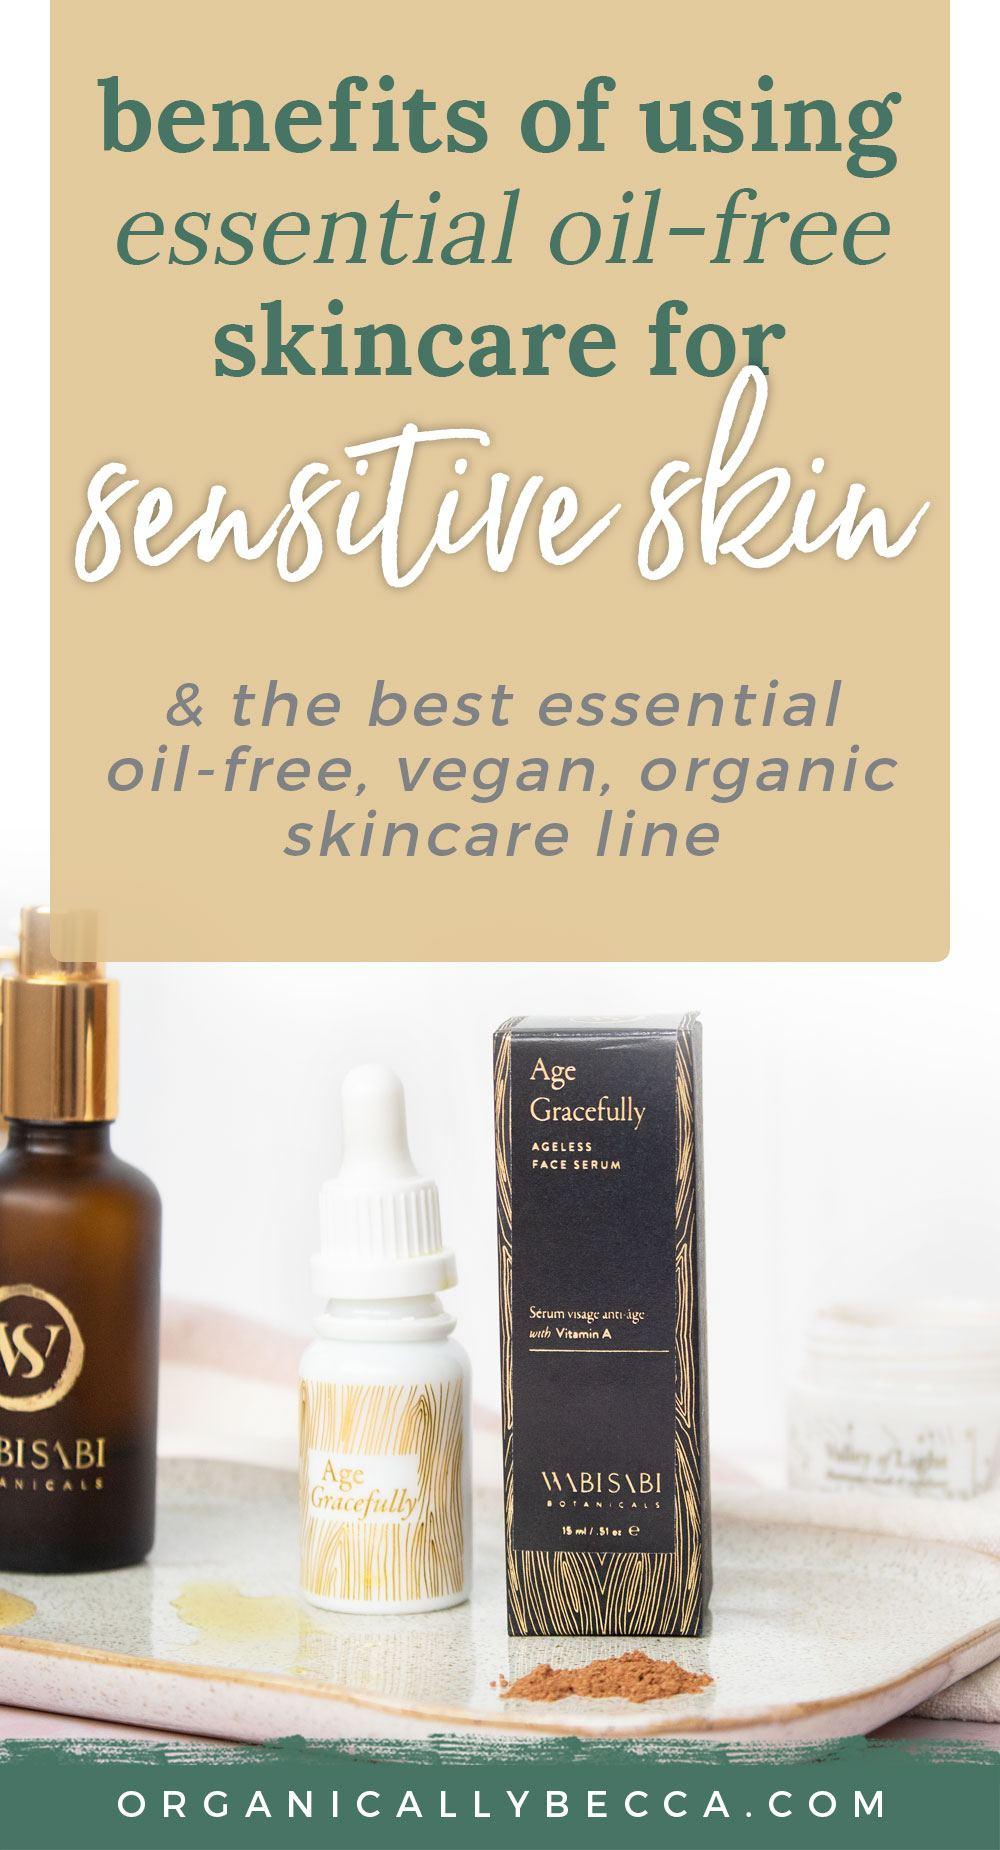 Pin me on Pinterest! | Wabi-Sabi Botanicals Essential Oil-Free Skincare